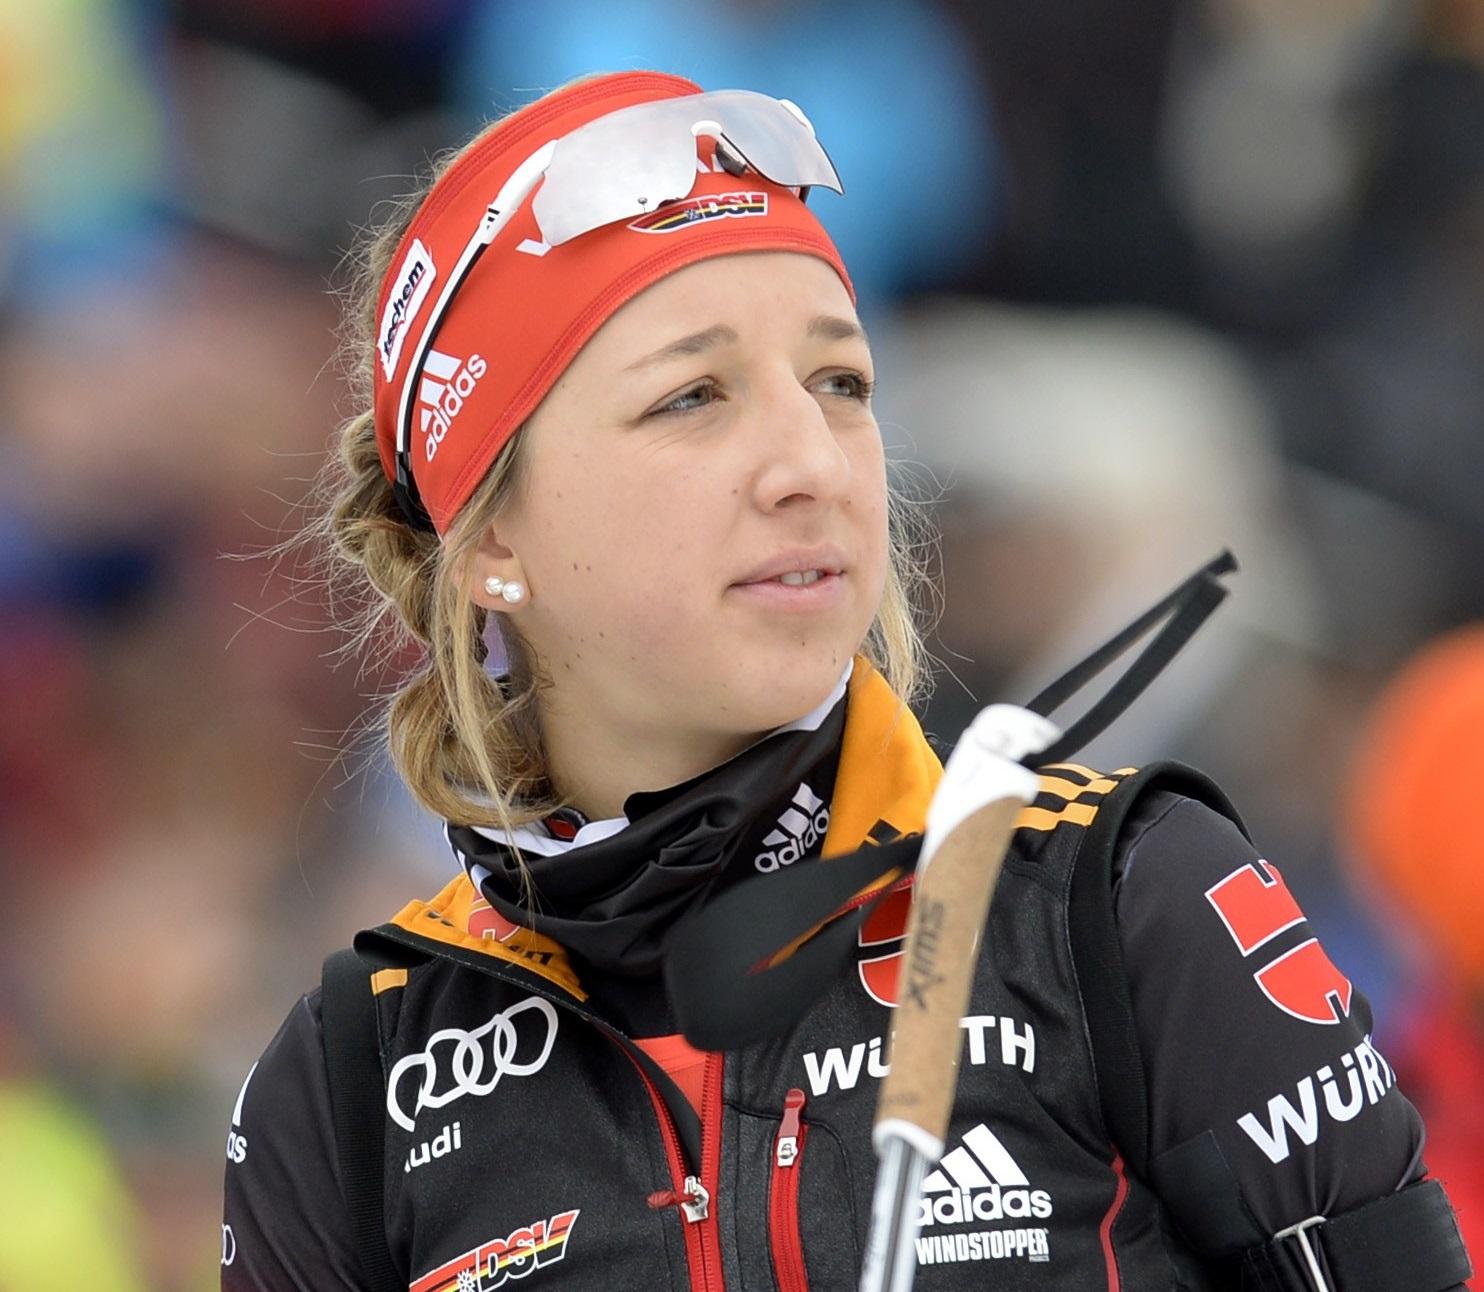 Biathlon Preuss